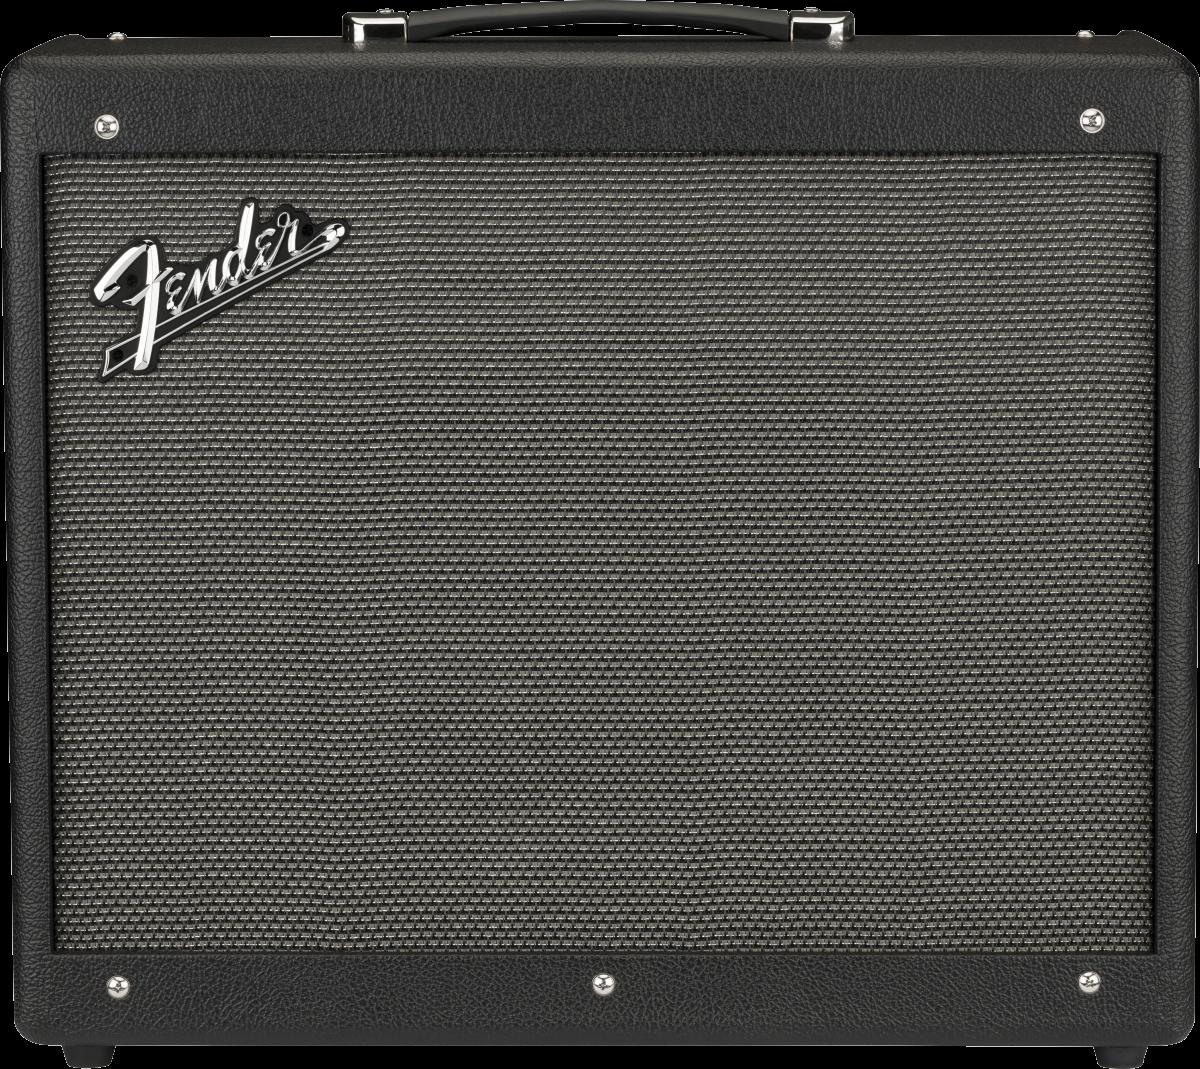 Fender Mustang. GTX100 Amplifier